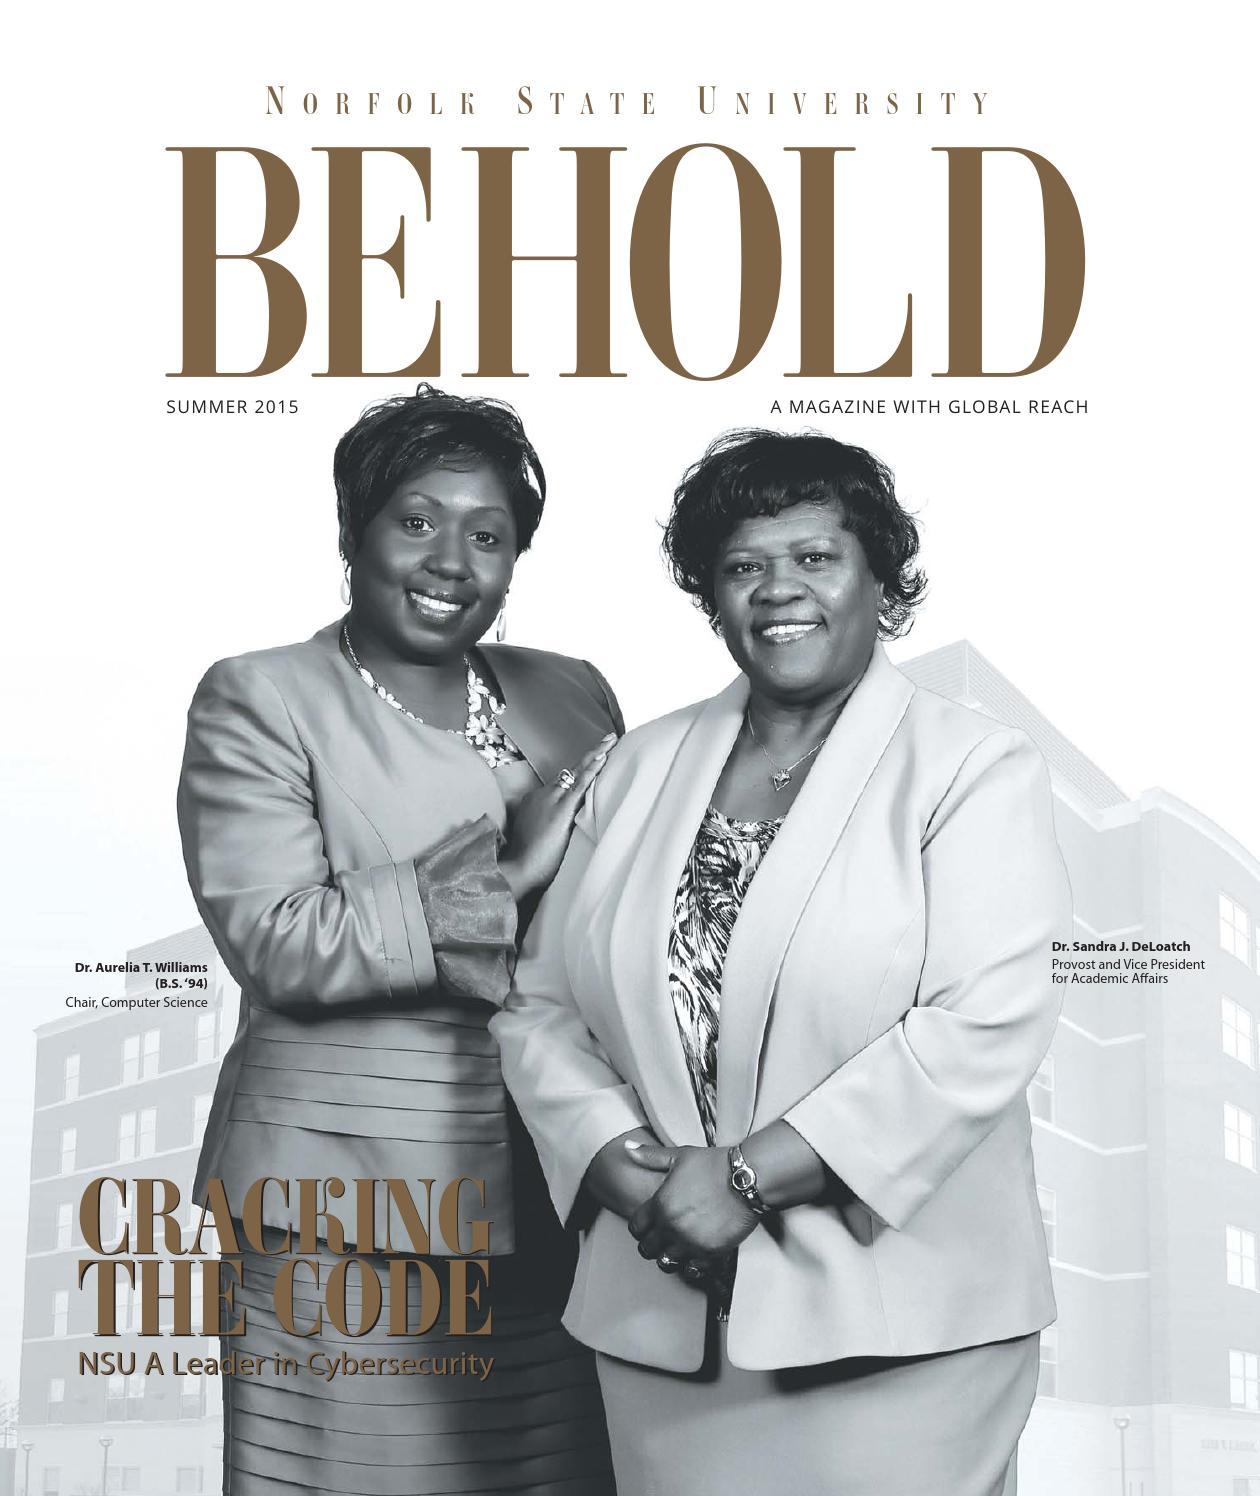 Behold Magazine Summer 2015 By Norfolk State University